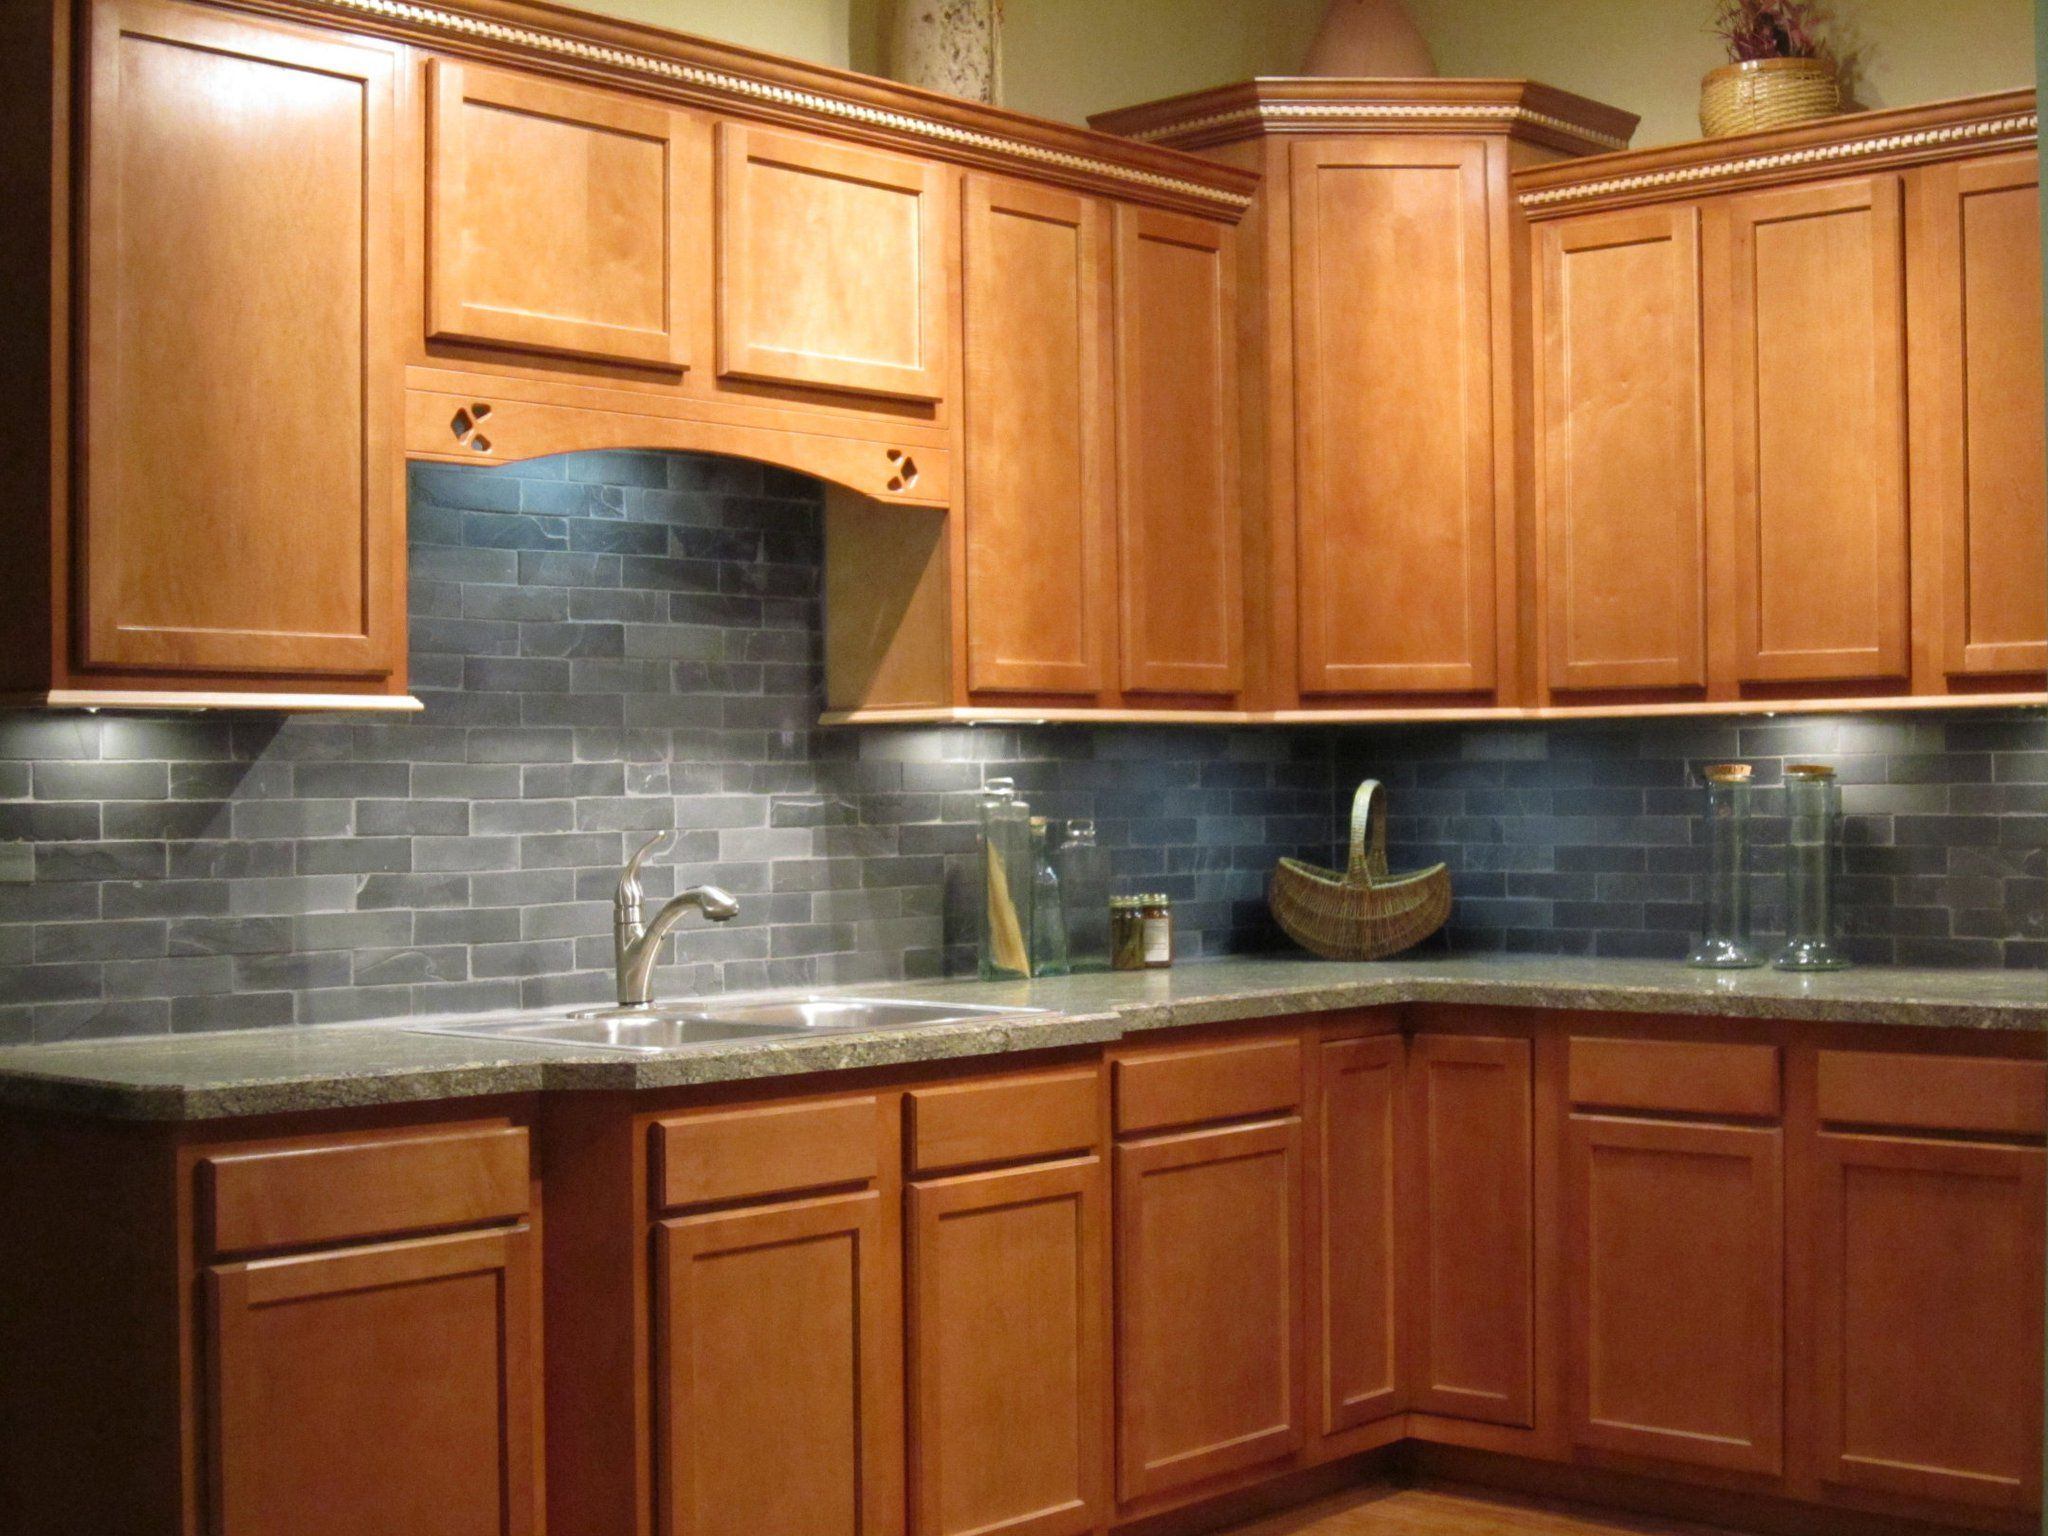 Bretwood Maple Display | Maple kitchen, Maple kitchen cabinets